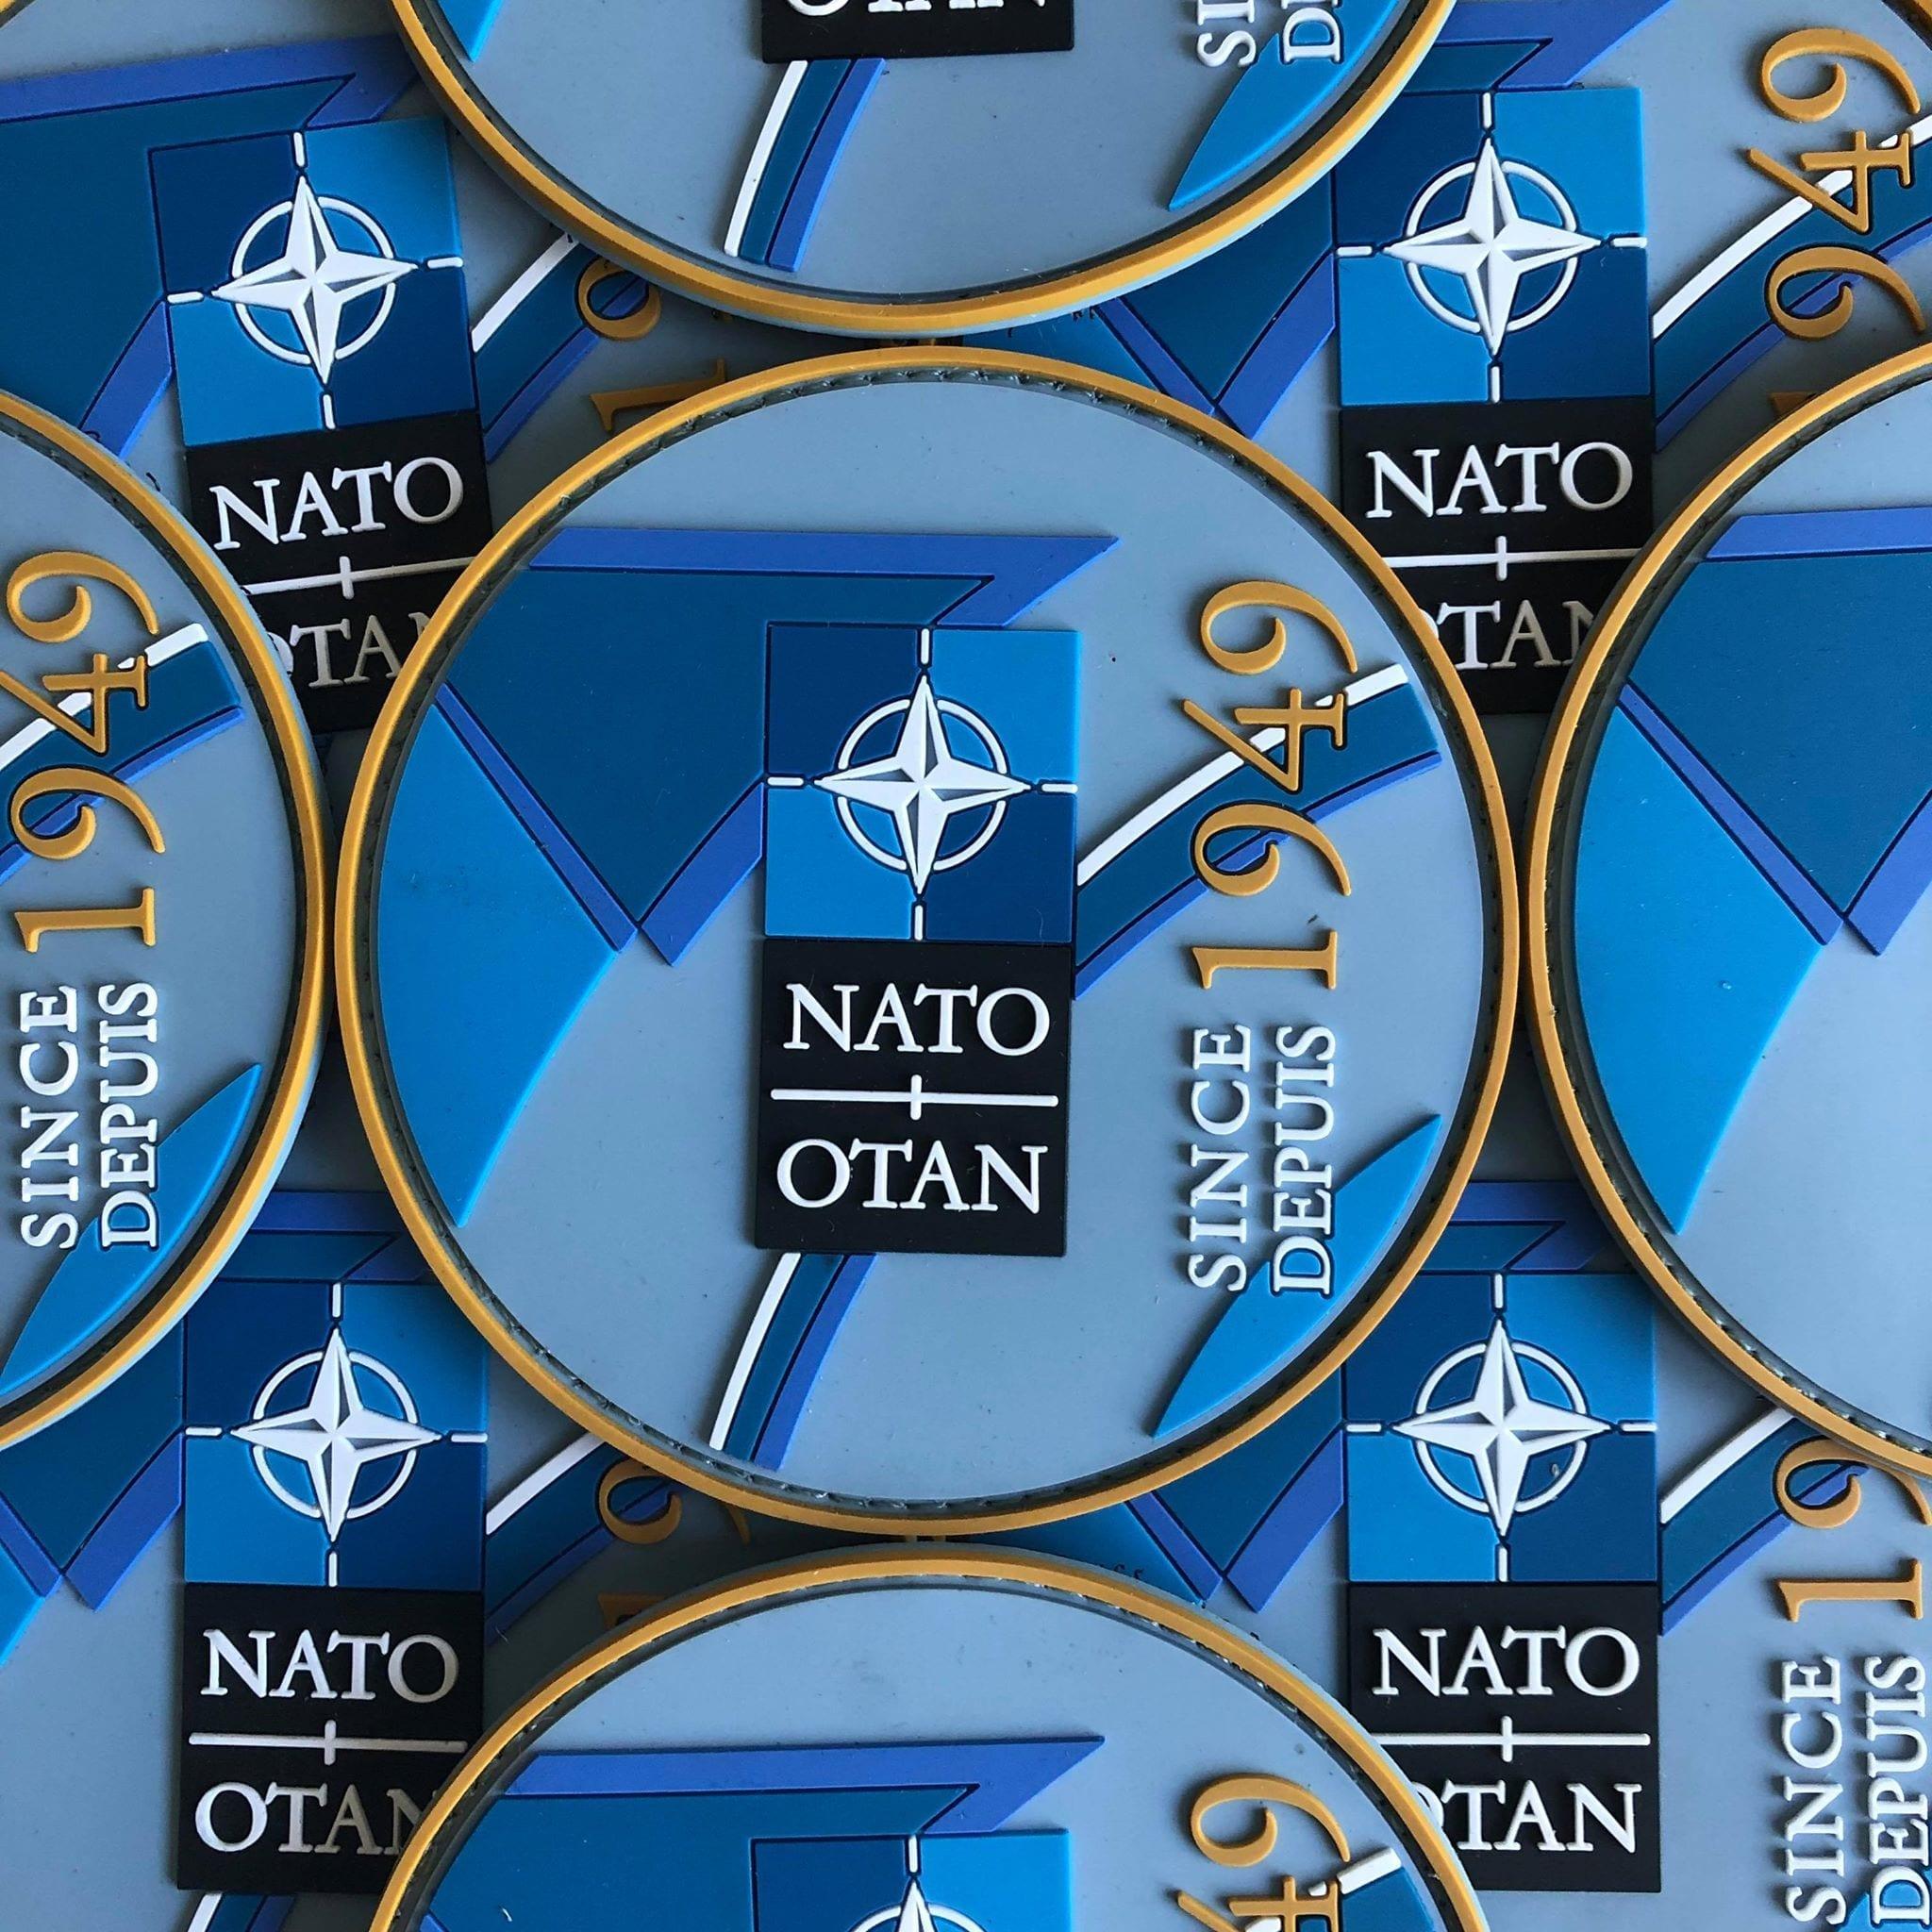 NATO70 Patch